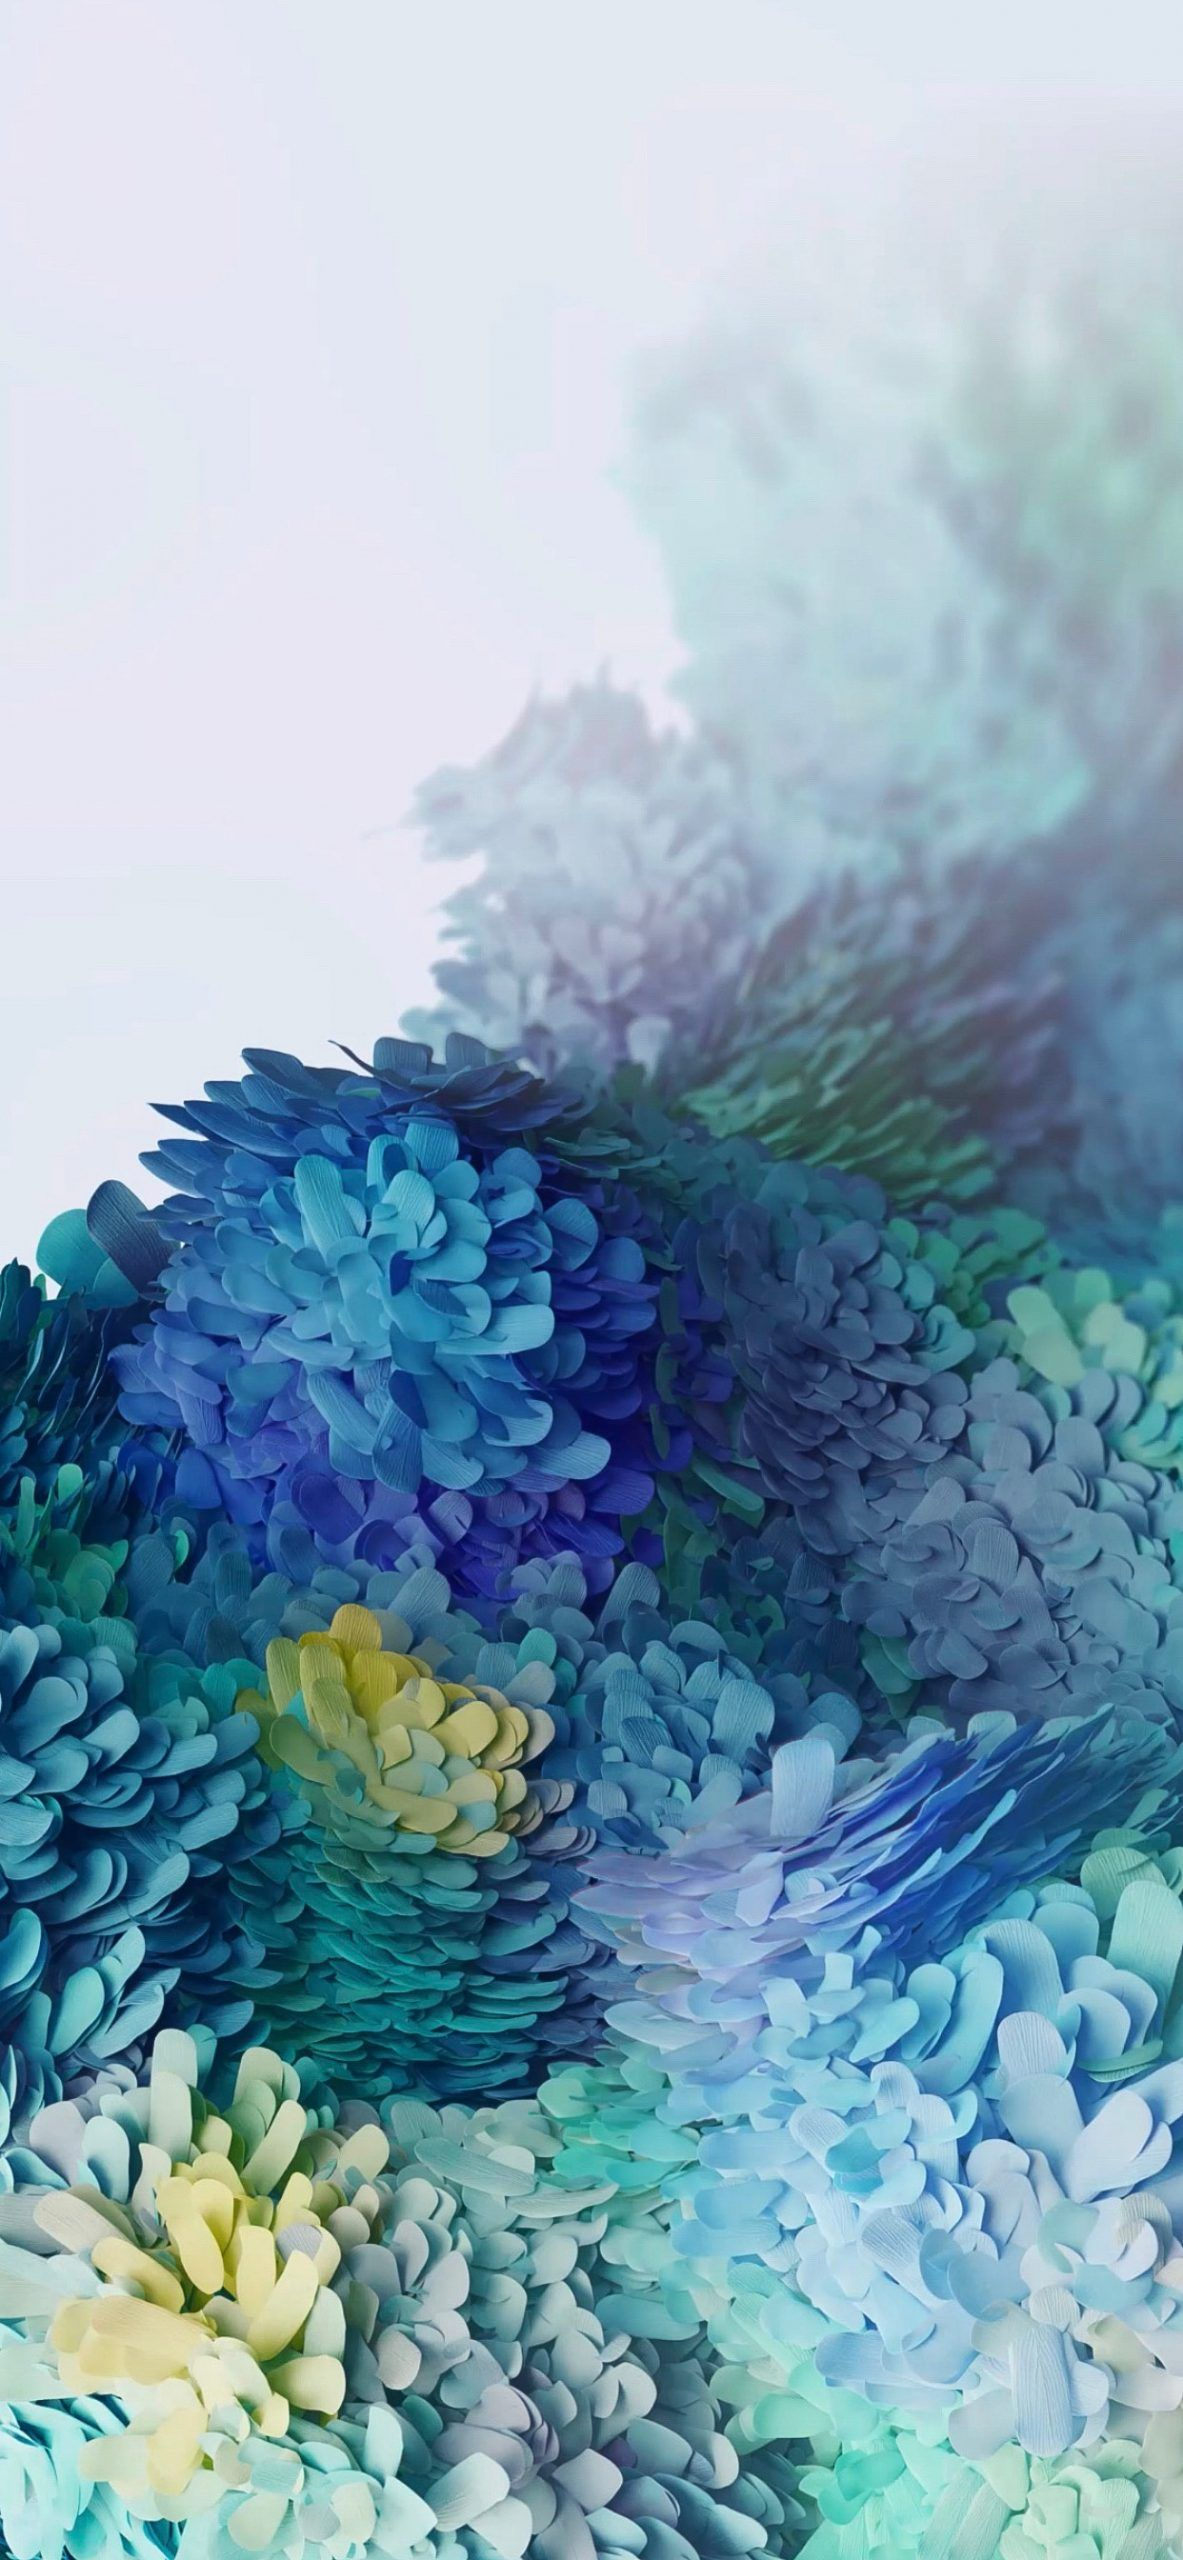 Samsung Galaxy S20 Ultra Default Wallpaper